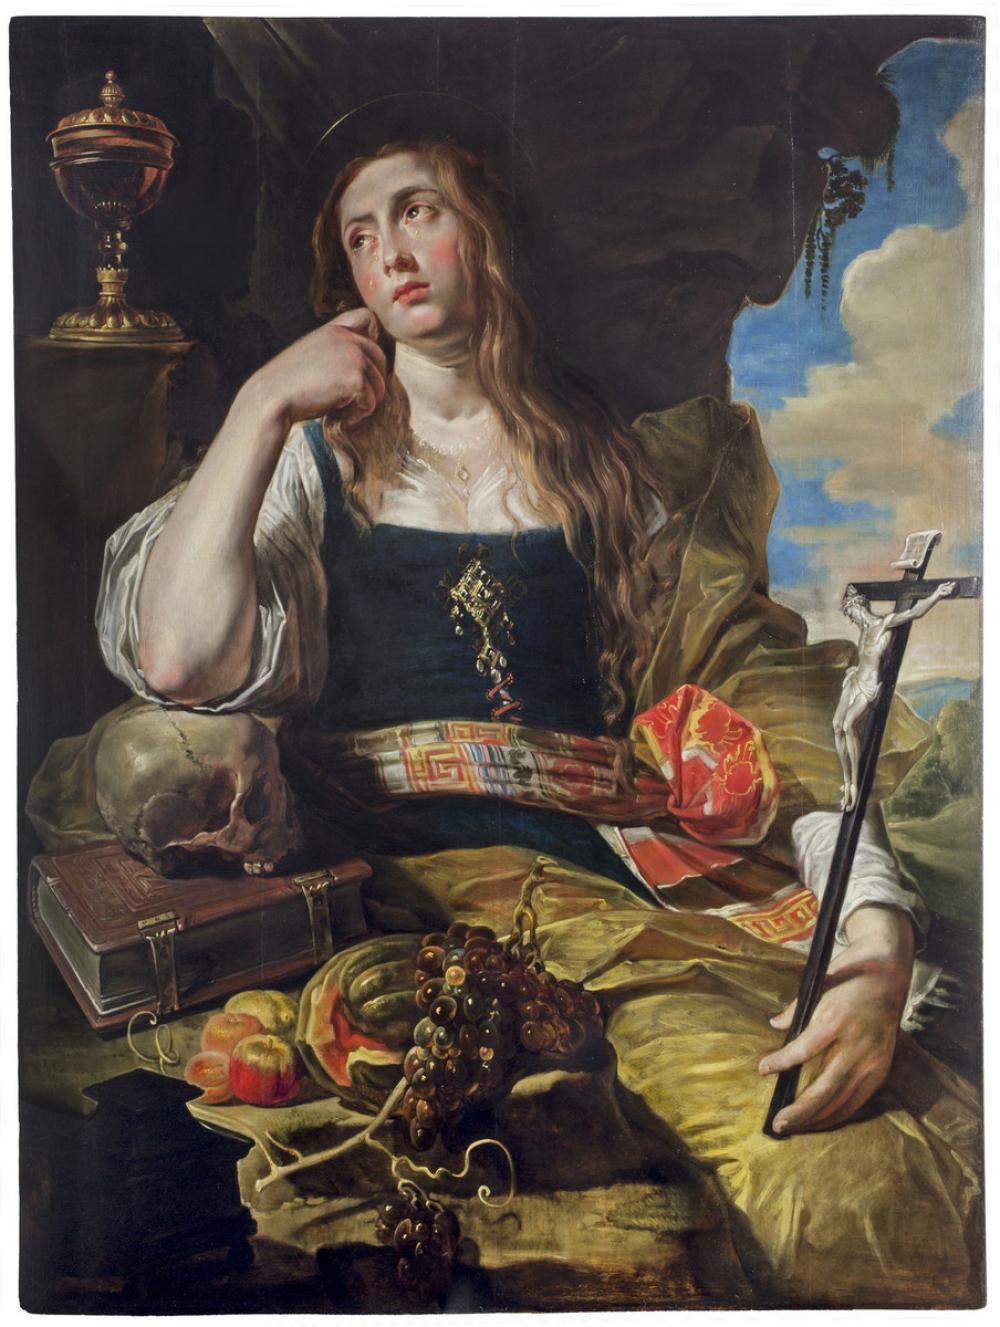 Abraham Janssens (Flemish, ca. 1575-1632), The Penitent Magdalene, ca. 1620